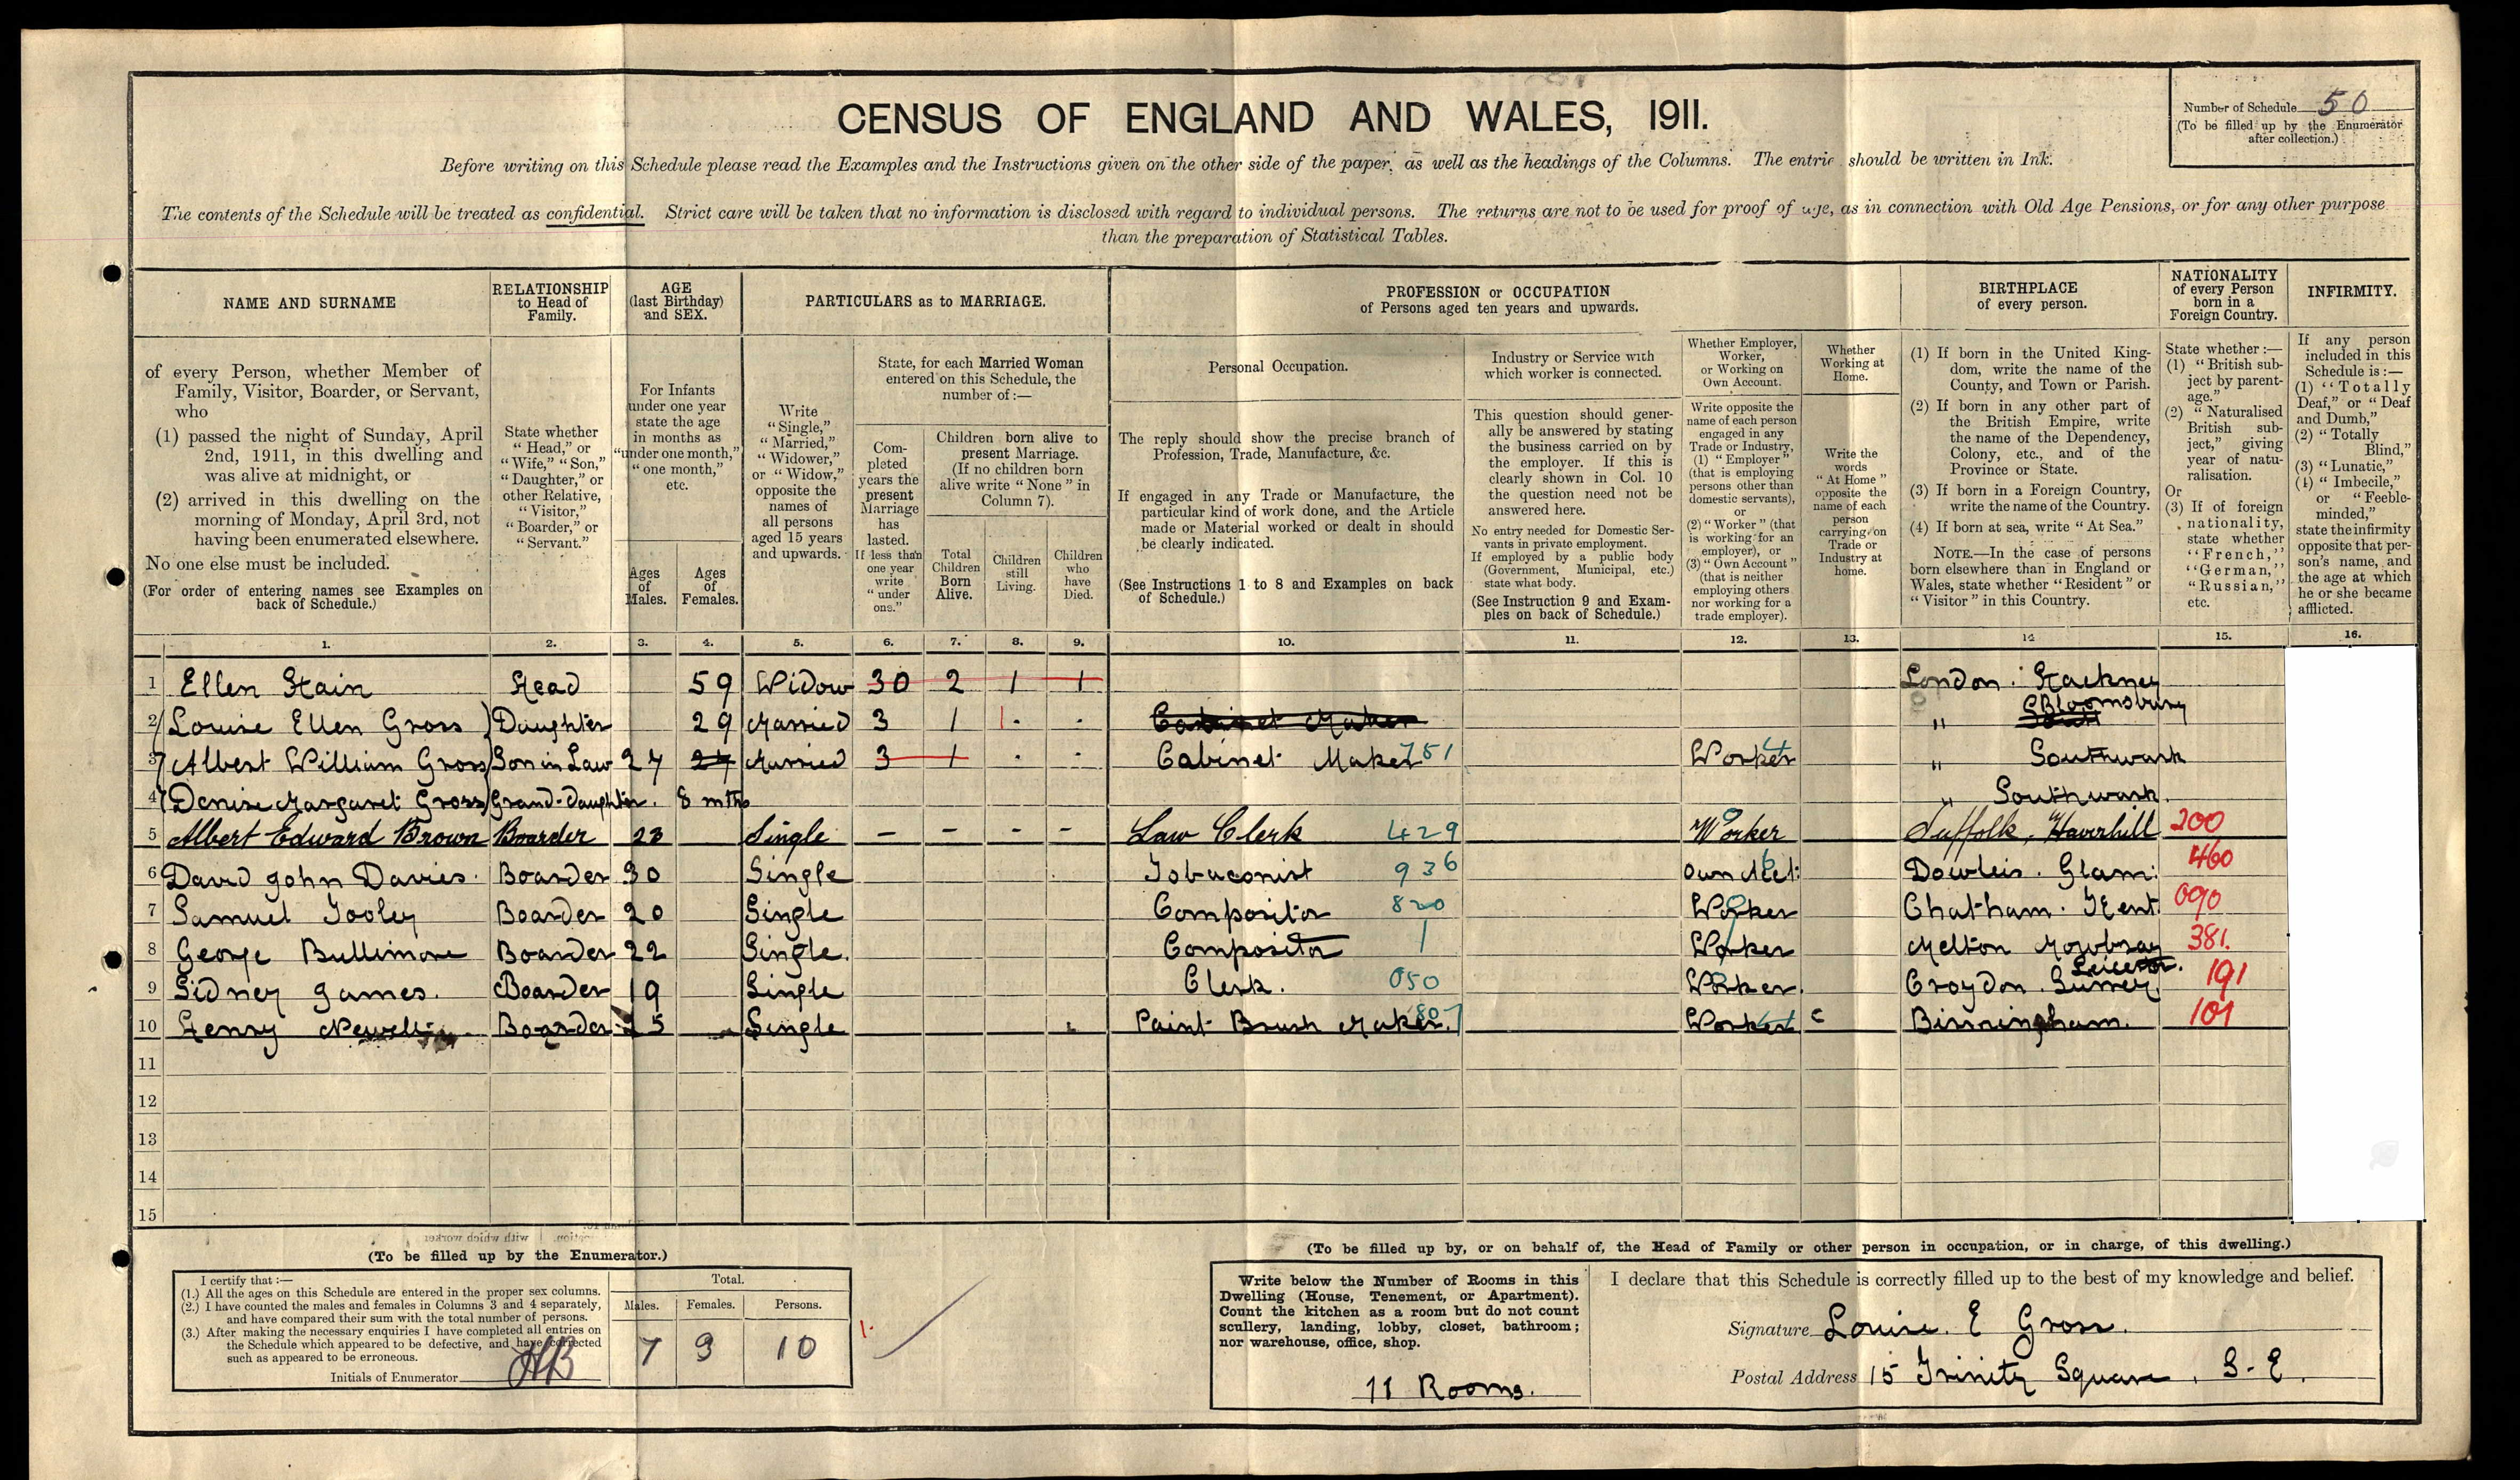 Brown, Albert Edward as a boarder at 15 Trinity Square, Bermondsey